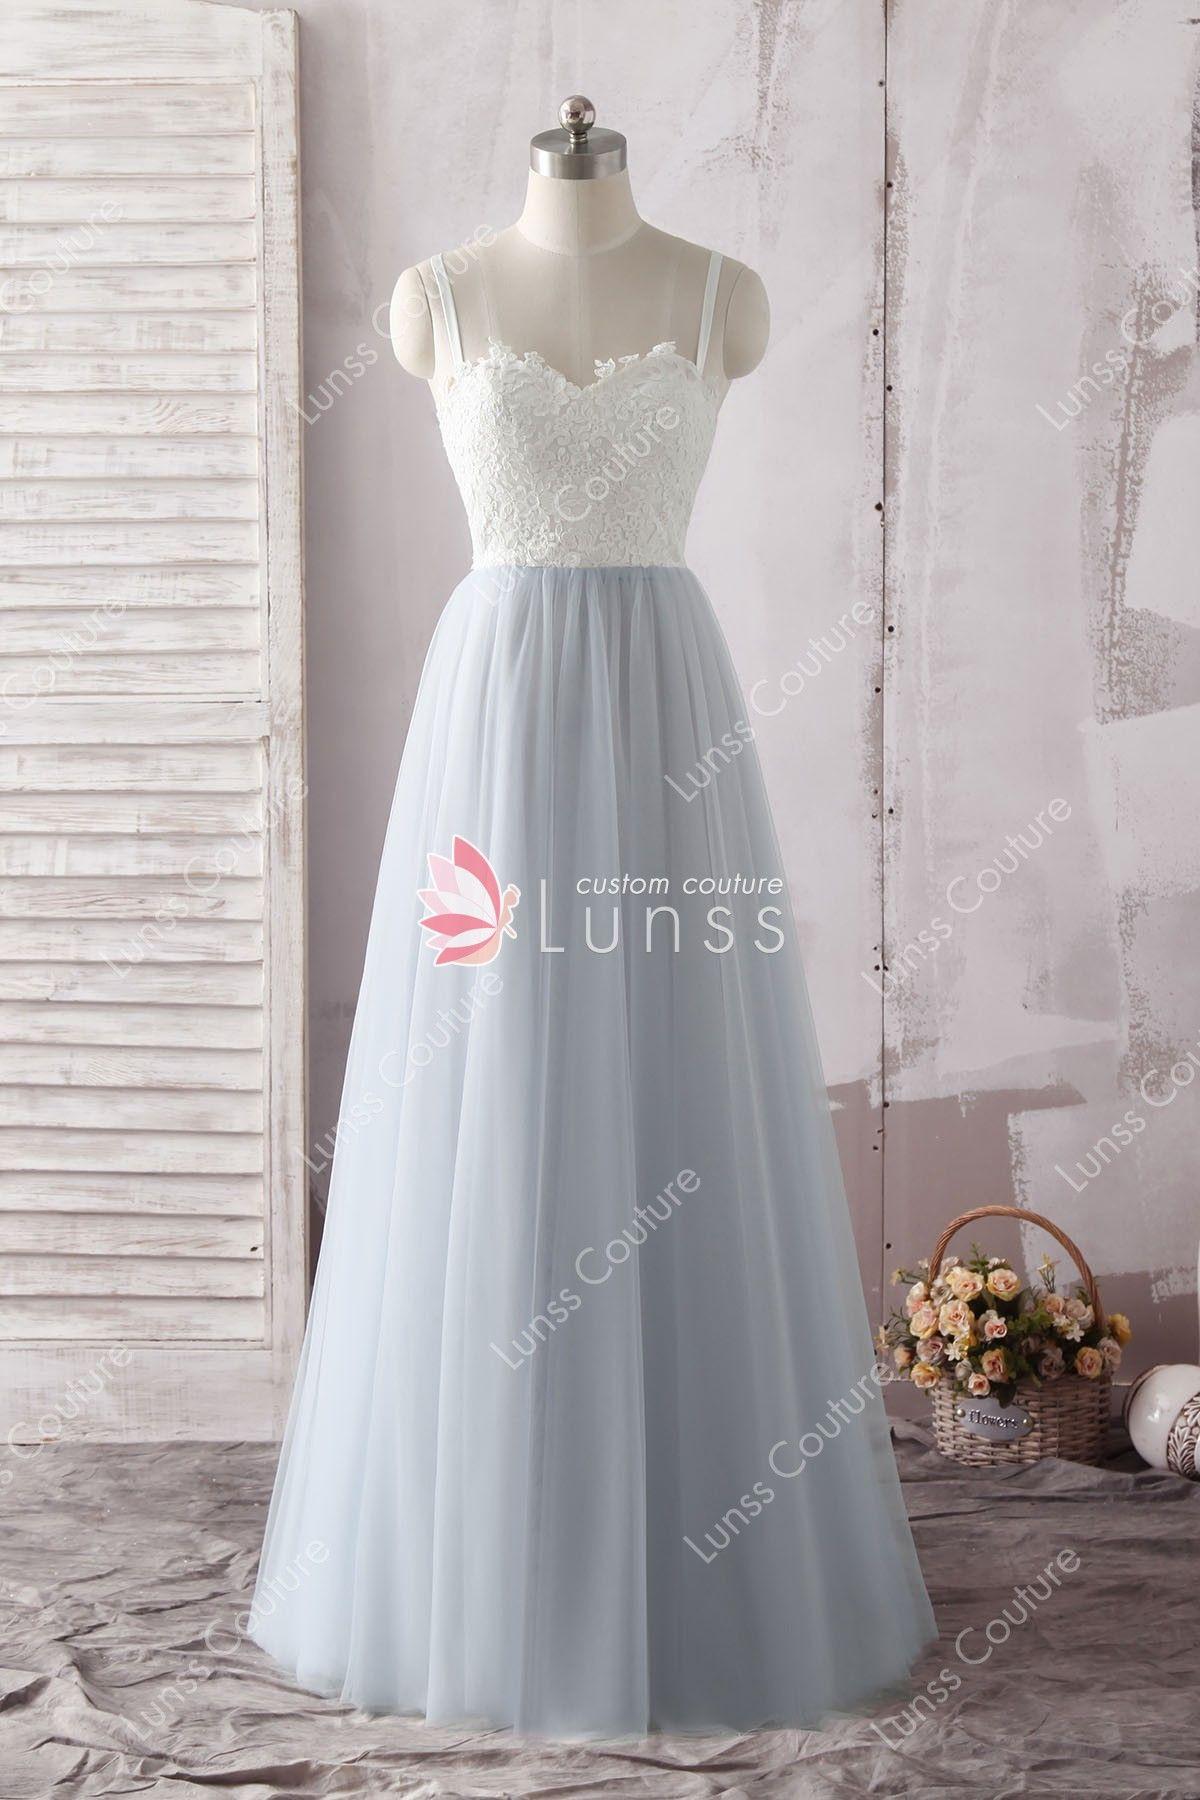 00d91c7831a0d Simple SPAGHETTI STRAP Semi-sweetheart Ivory Lace Bodice Slate Blue Tulle  Long Bridesmaid Dress